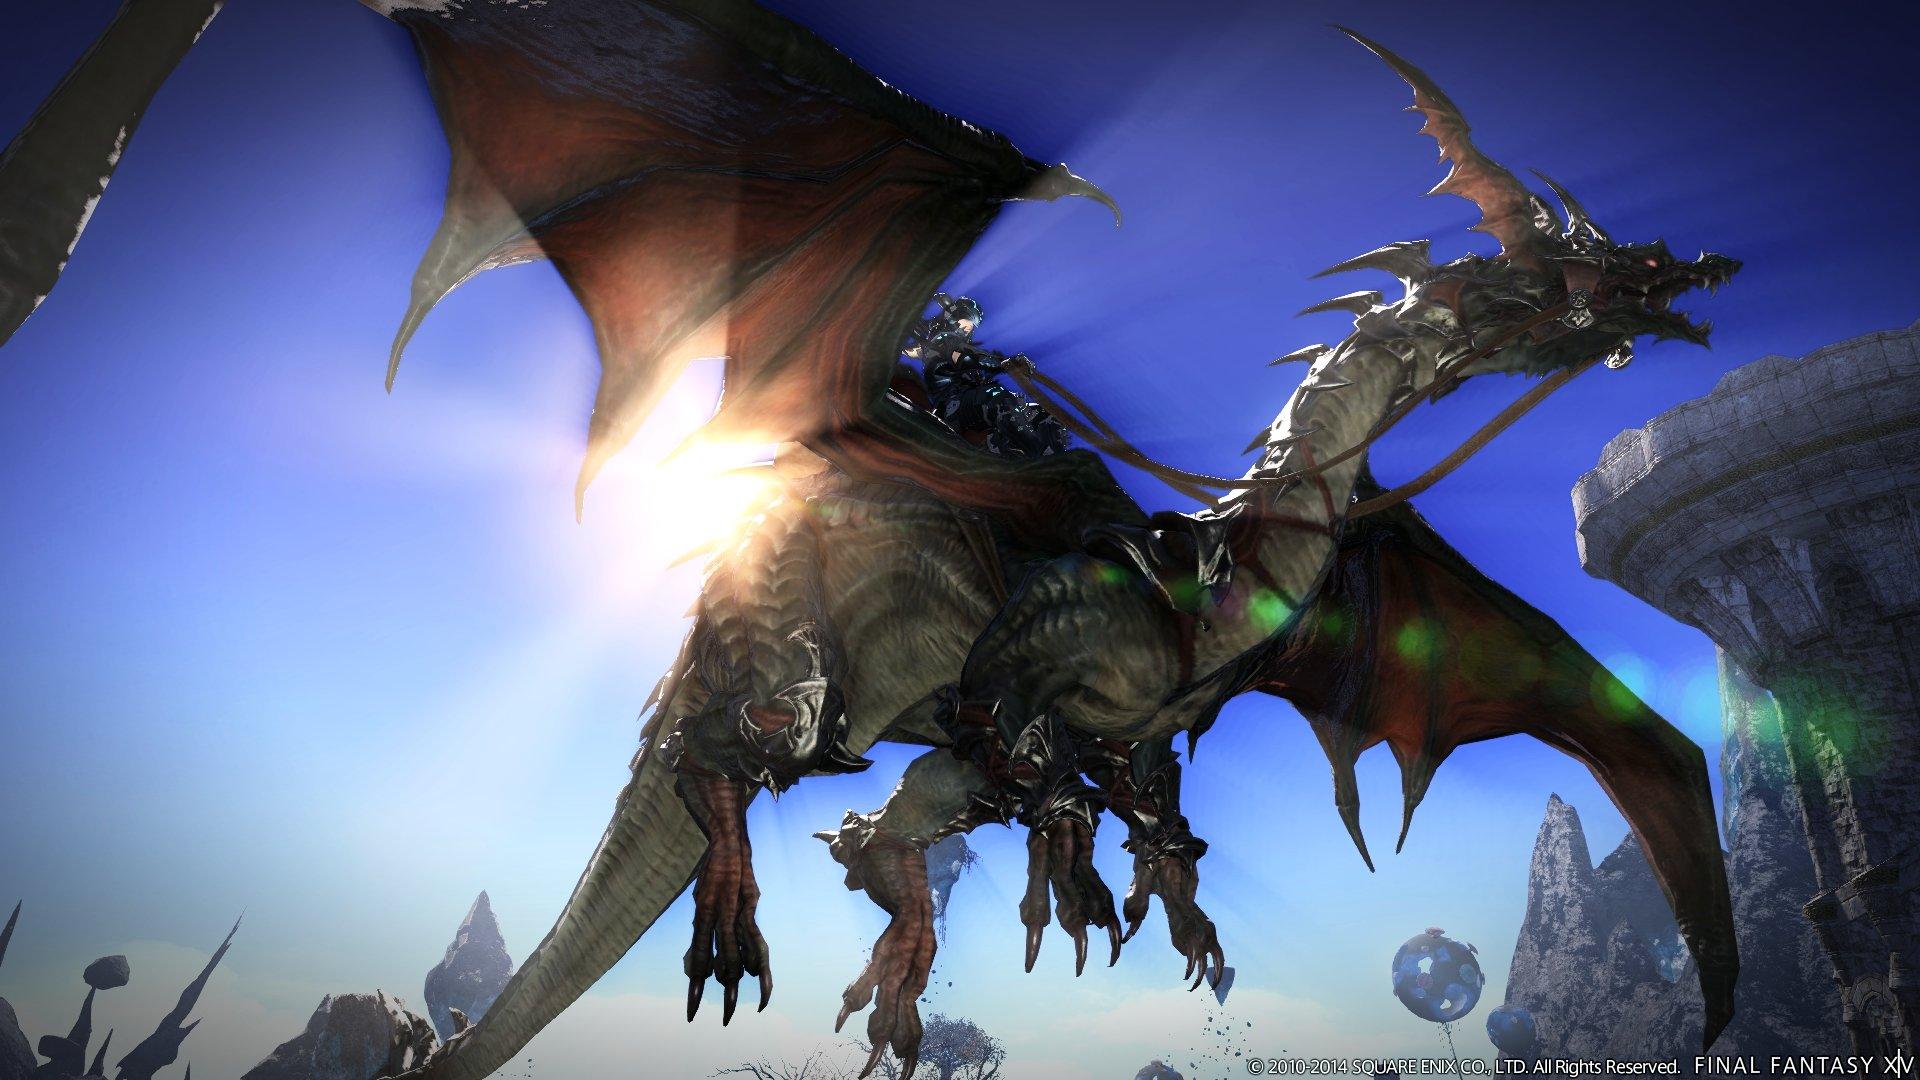 Square Enix has made Final Fantasy XIV's Heavensward expansion free screenshot